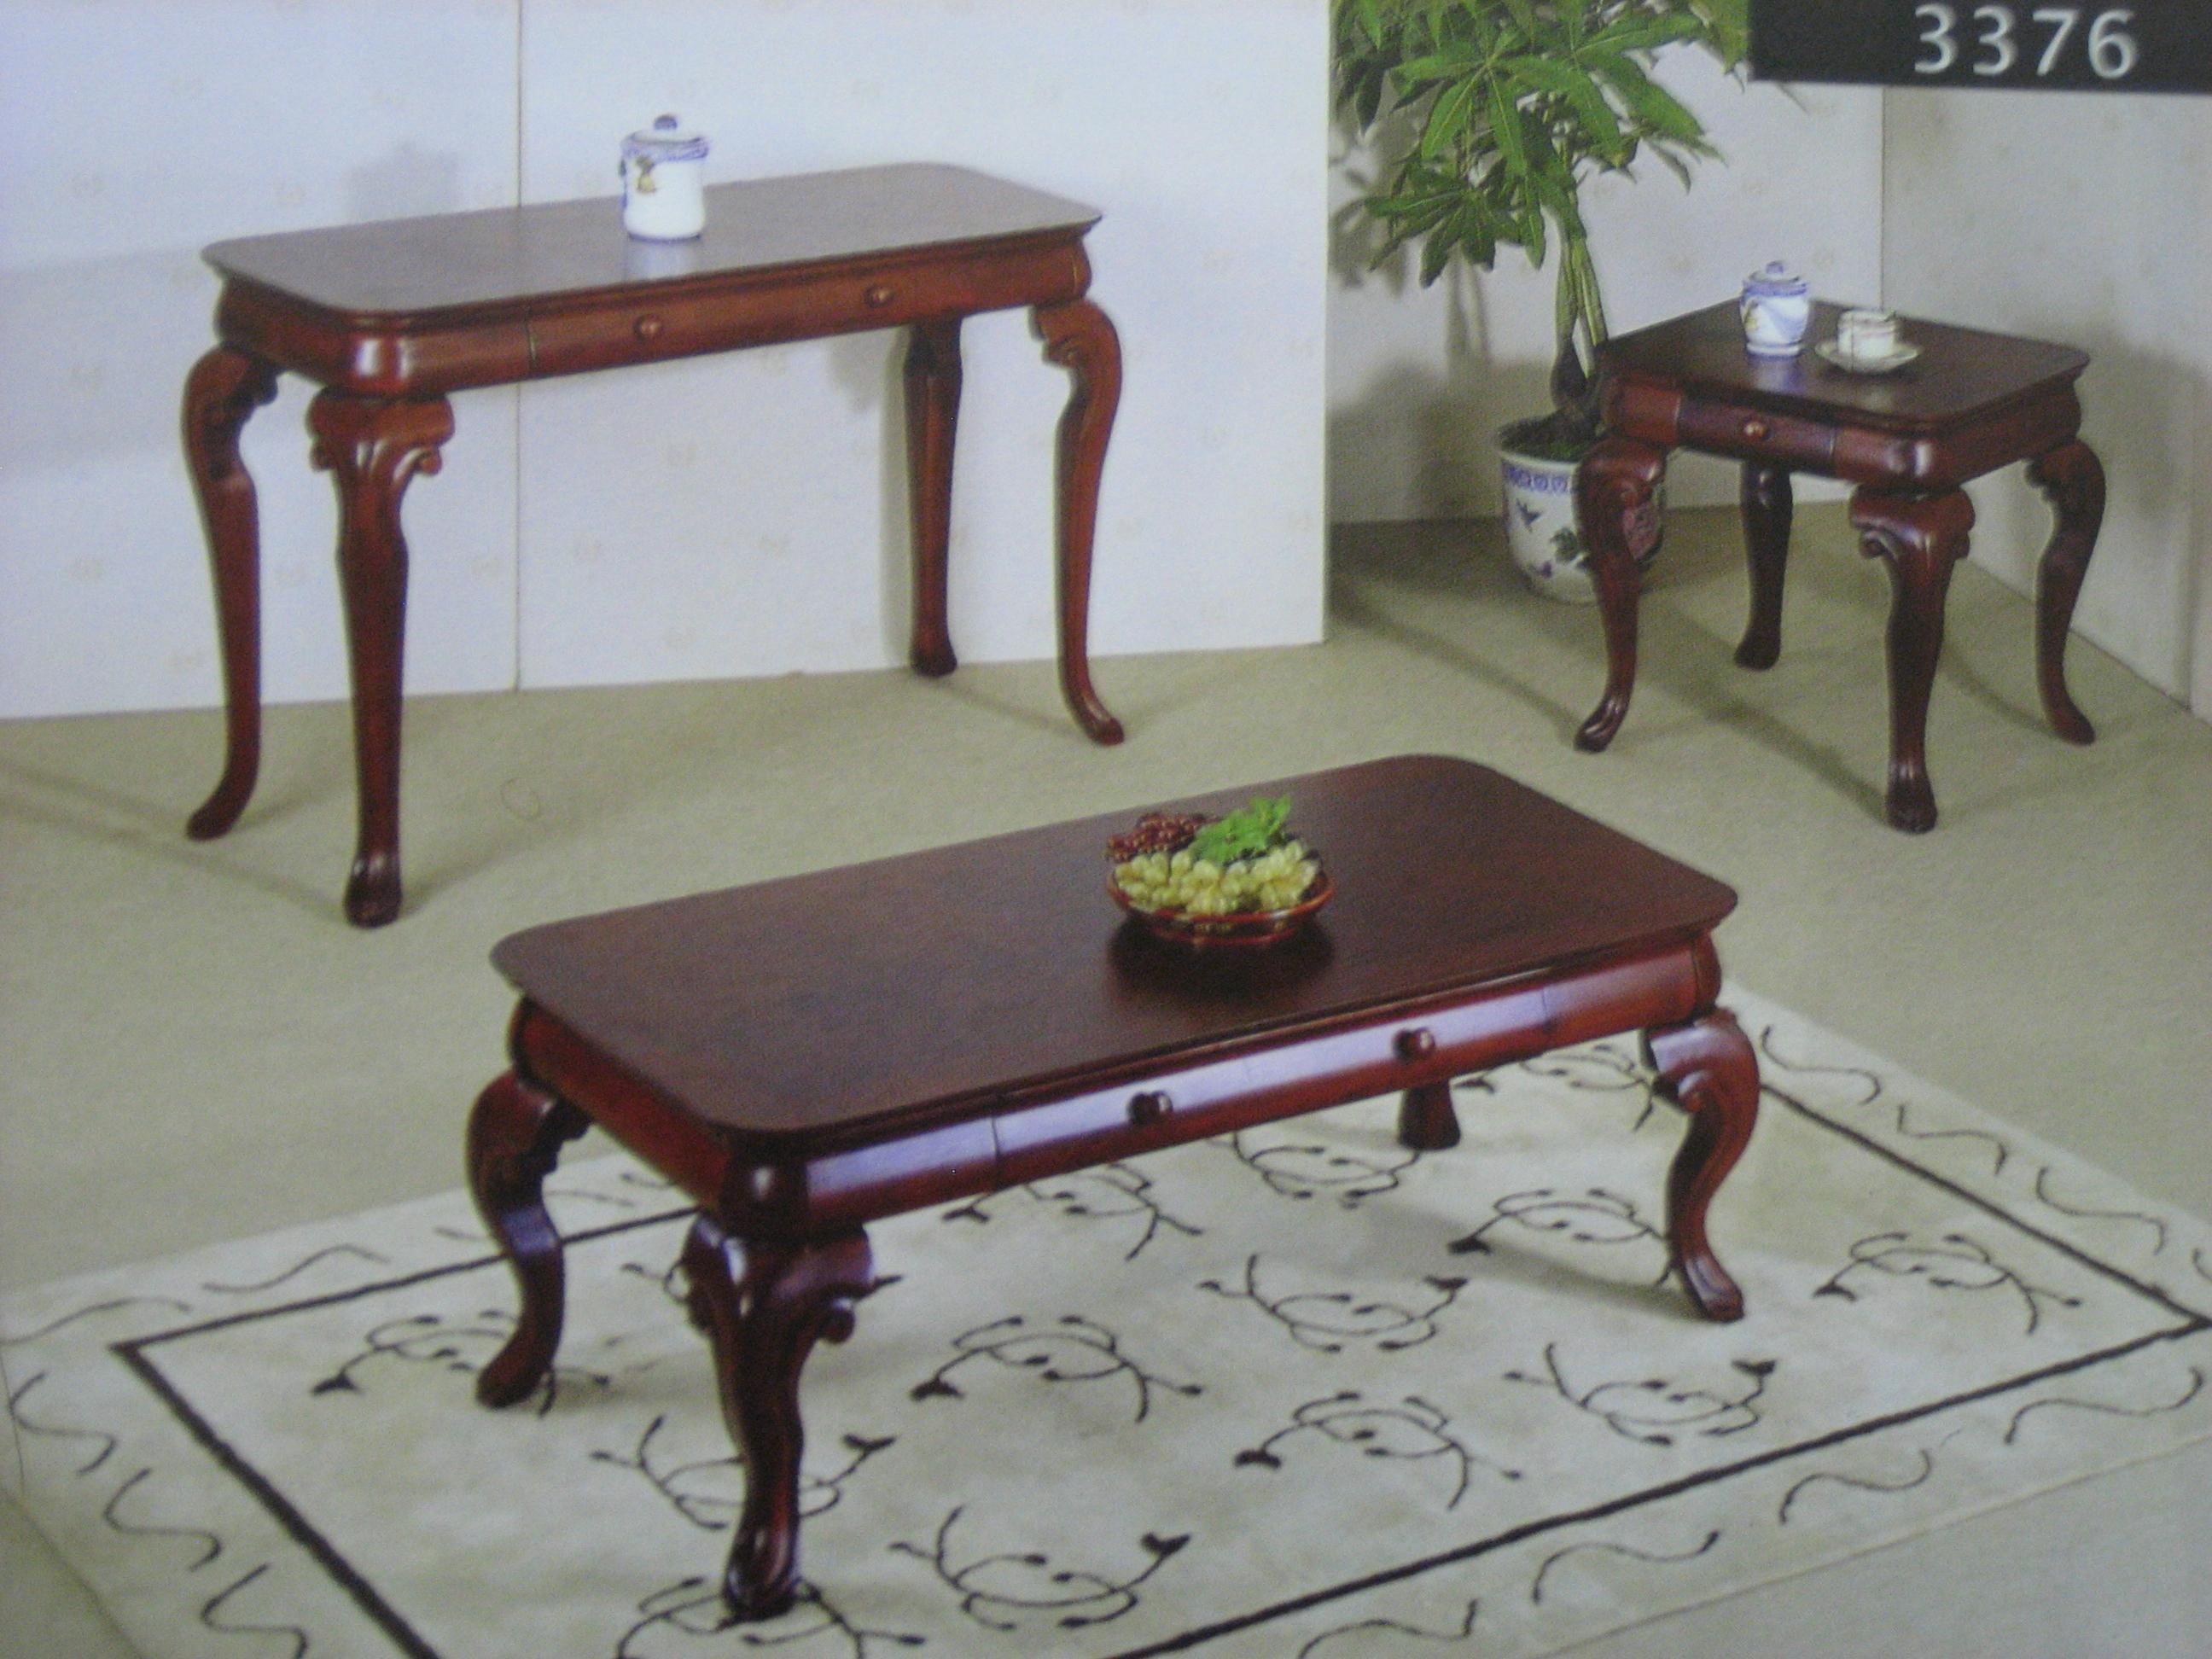 sofa table set nautical sleeper 3376 coffee 43 2 end tables 3376s